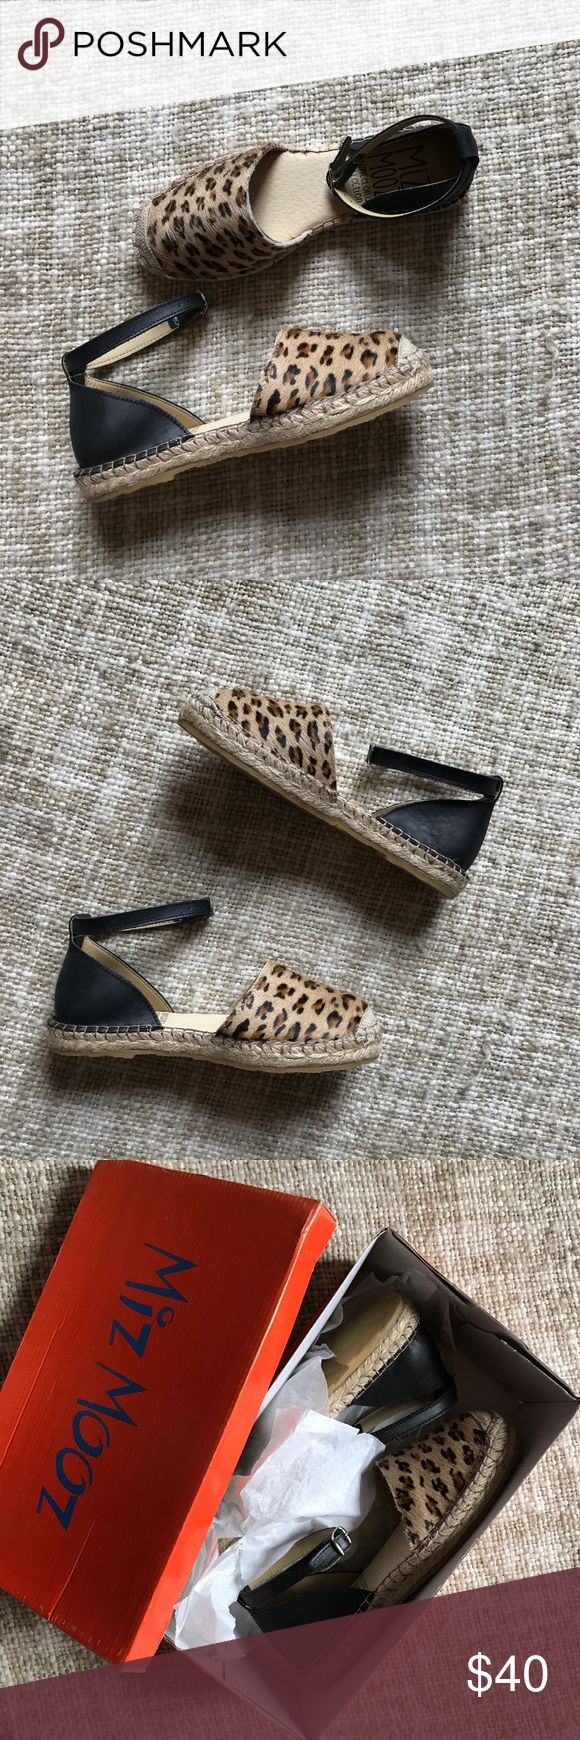 Mix Mooz Leopard Espadrilles Calf Hair Leopard Calf hair, leather and jute espadrilles. Brand new in box! Size 37 fits a US 6.5 Miz Mooz Shoes Espadrilles